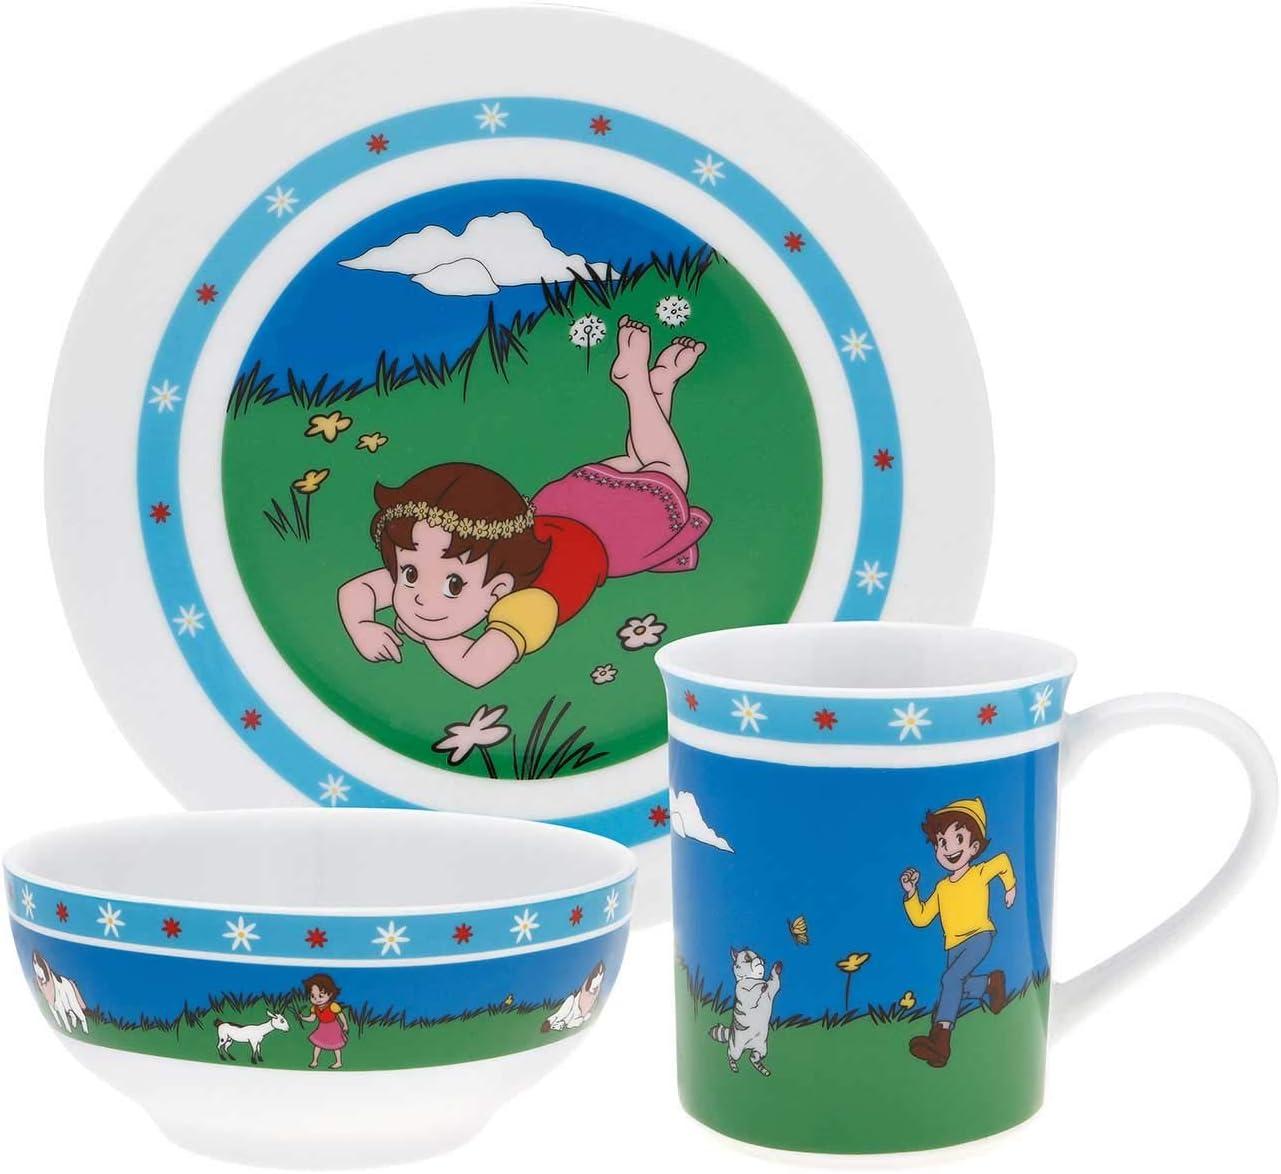 Puresigns 2030300 Kindergeschirr Set 3-teilig Heidi